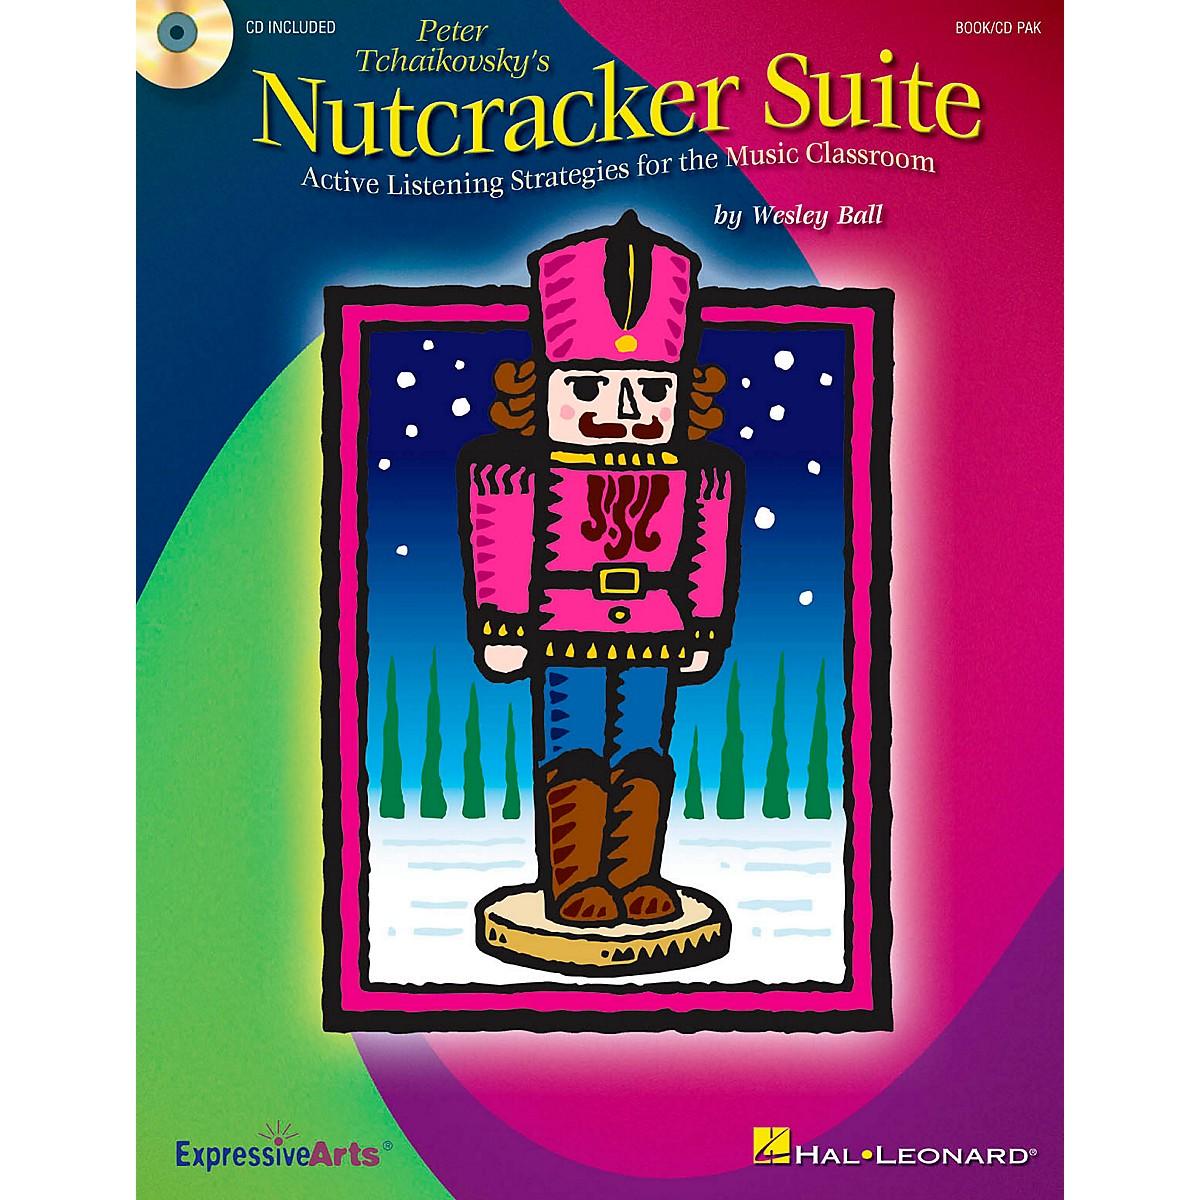 Hal Leonard Nutcracker Suite - Active Listening Strategies for the Music Classroom - Classroom Kit